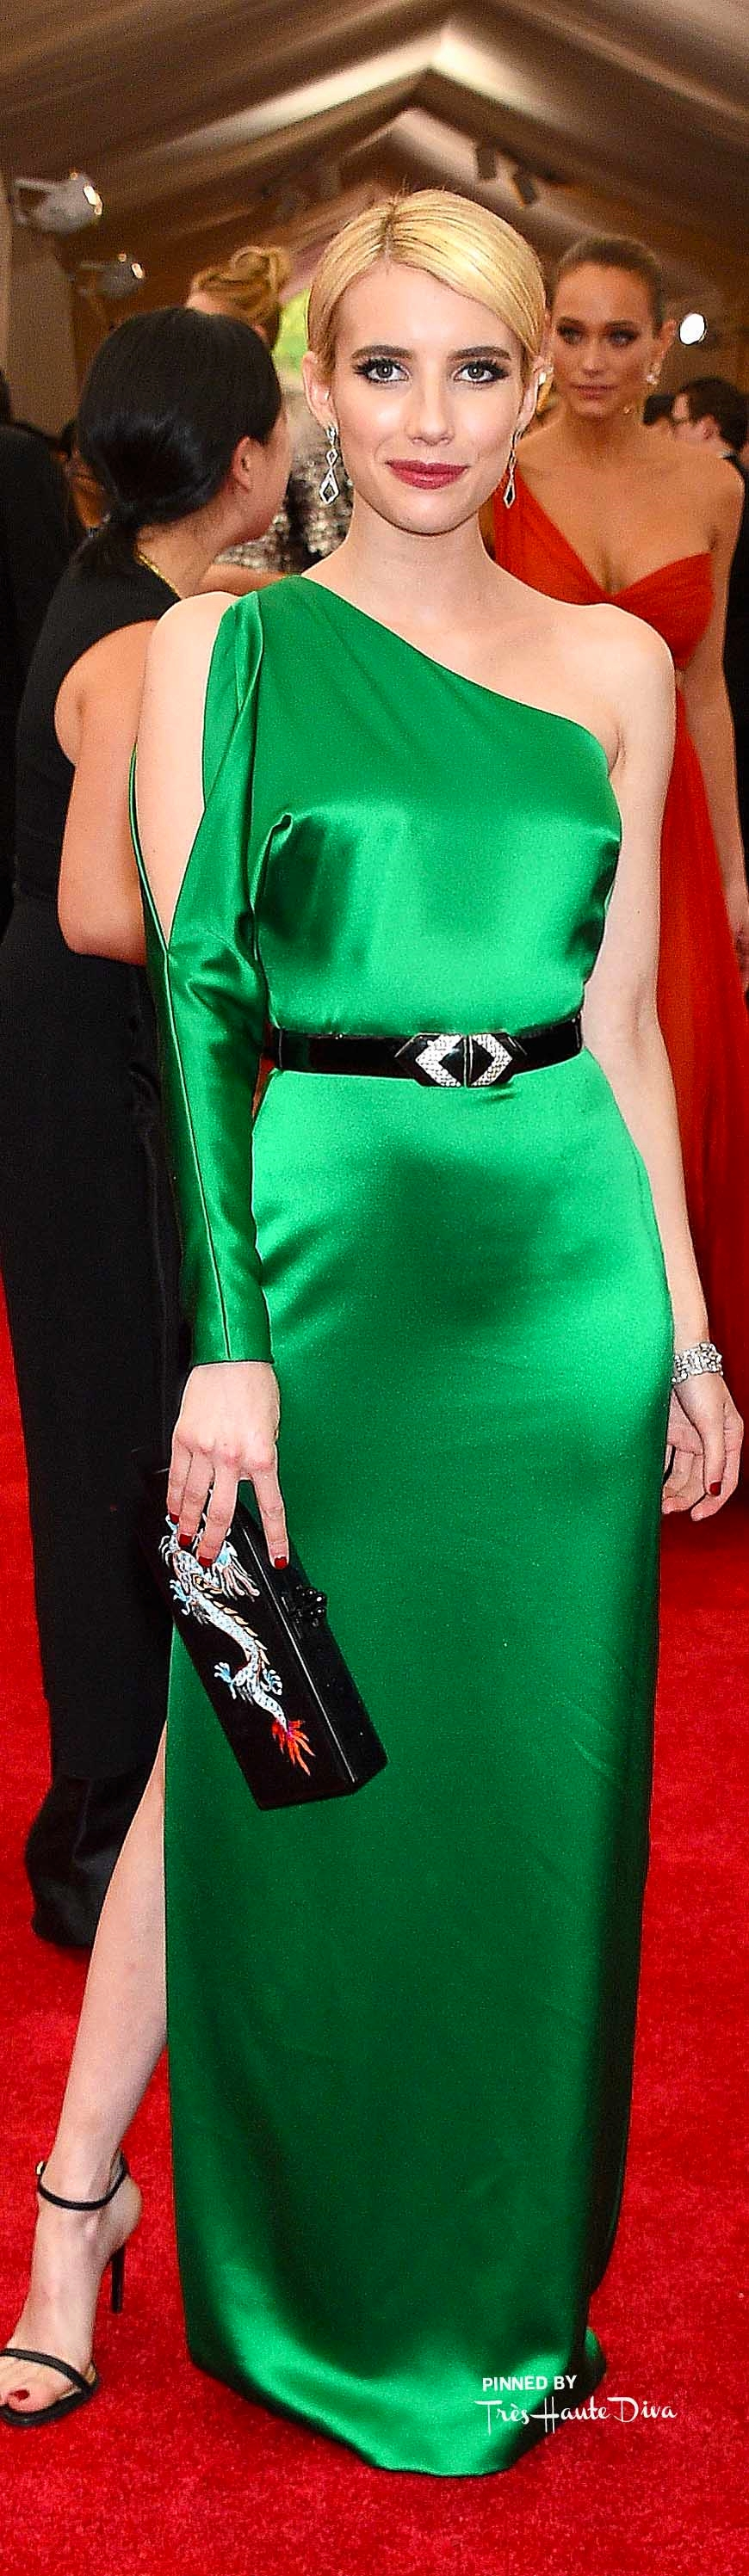 Emma Roberts in Ralph Lauren Getty Images/ Larry Busacca